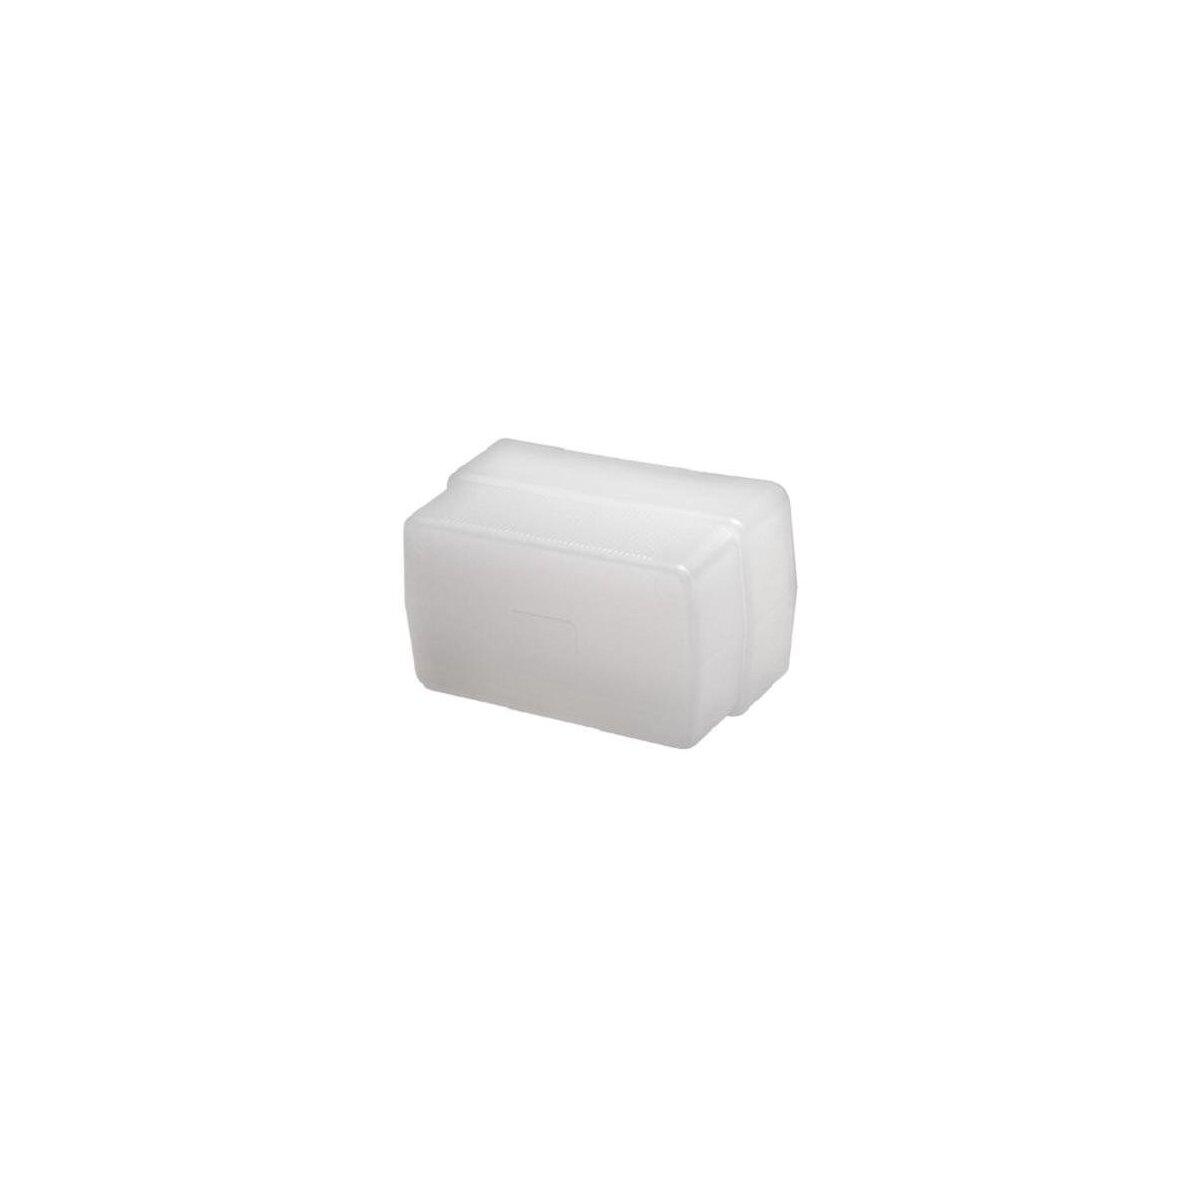 Minadax Diffusor, Weichmacher, Bouncer, Softbox kompatibel mit Metz mecablitz 58 AF-1 digital, Metz mecablitz 48 AF-1 digital